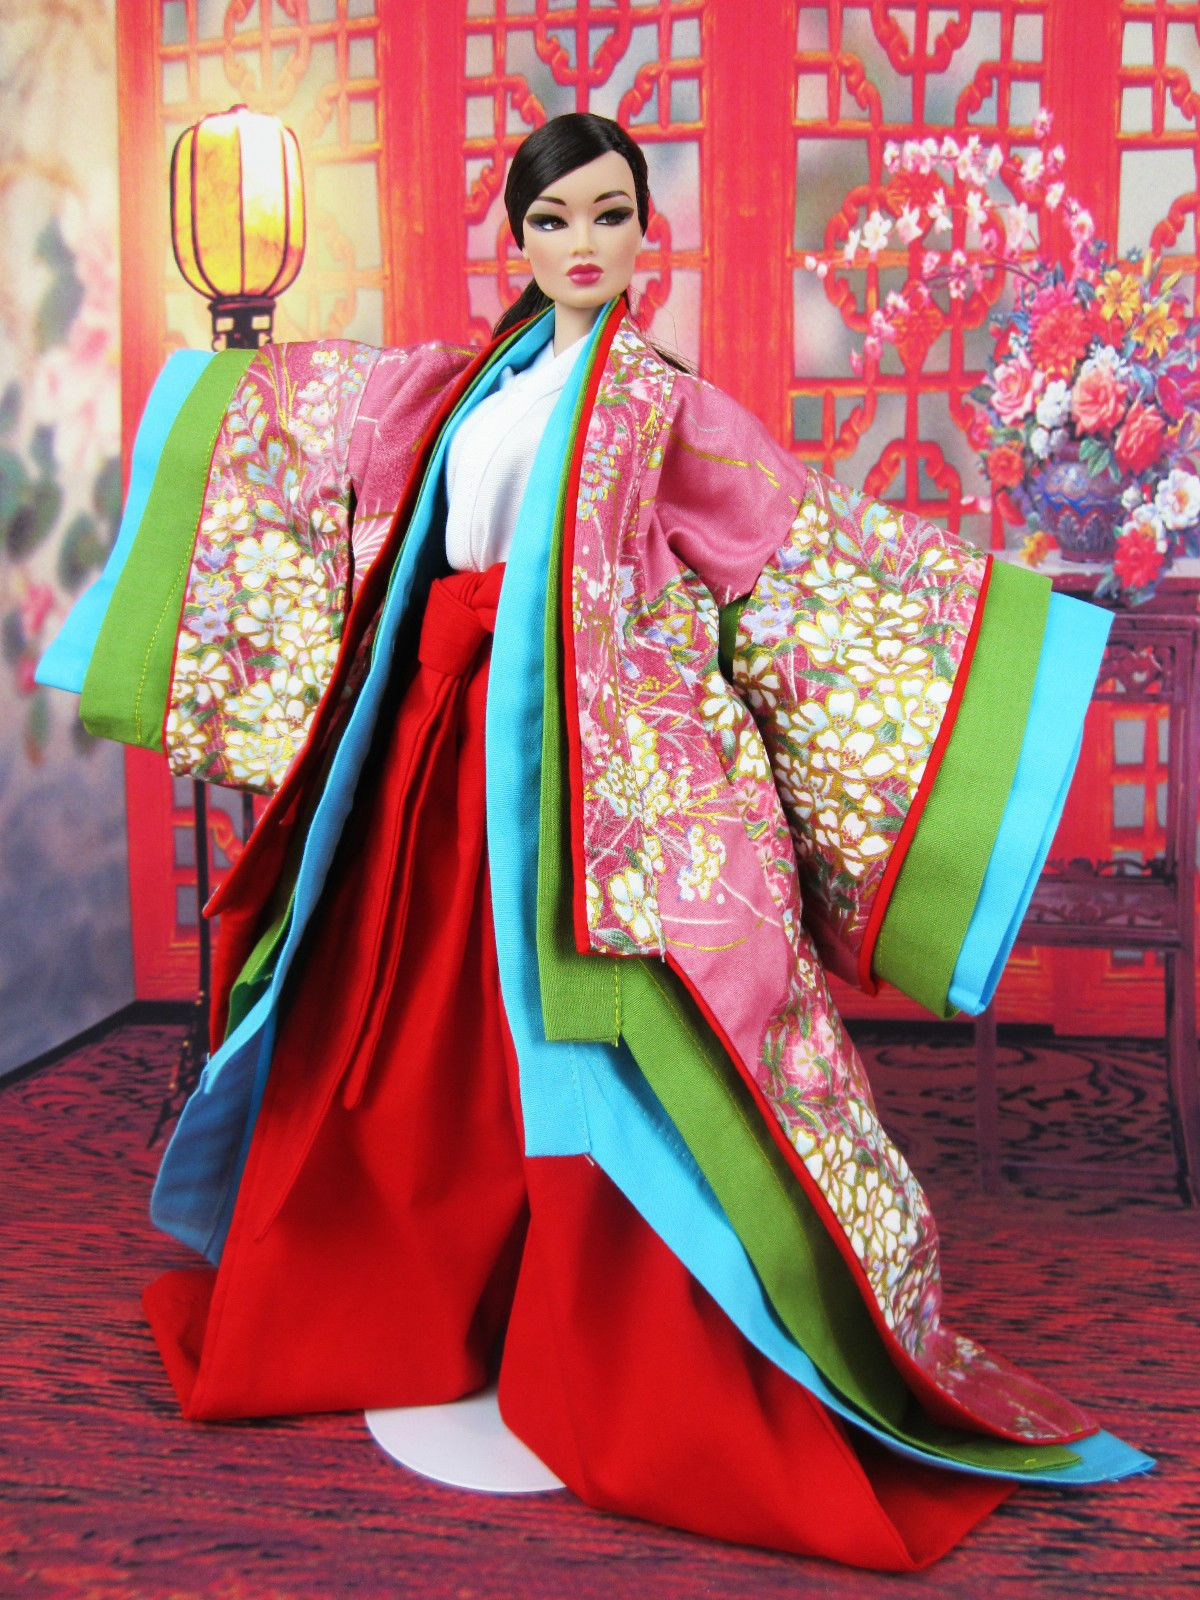 Eaki Black Fur Coat Gown Evening Dress Silkstone Barbie Fashion Royalty FR Jenny